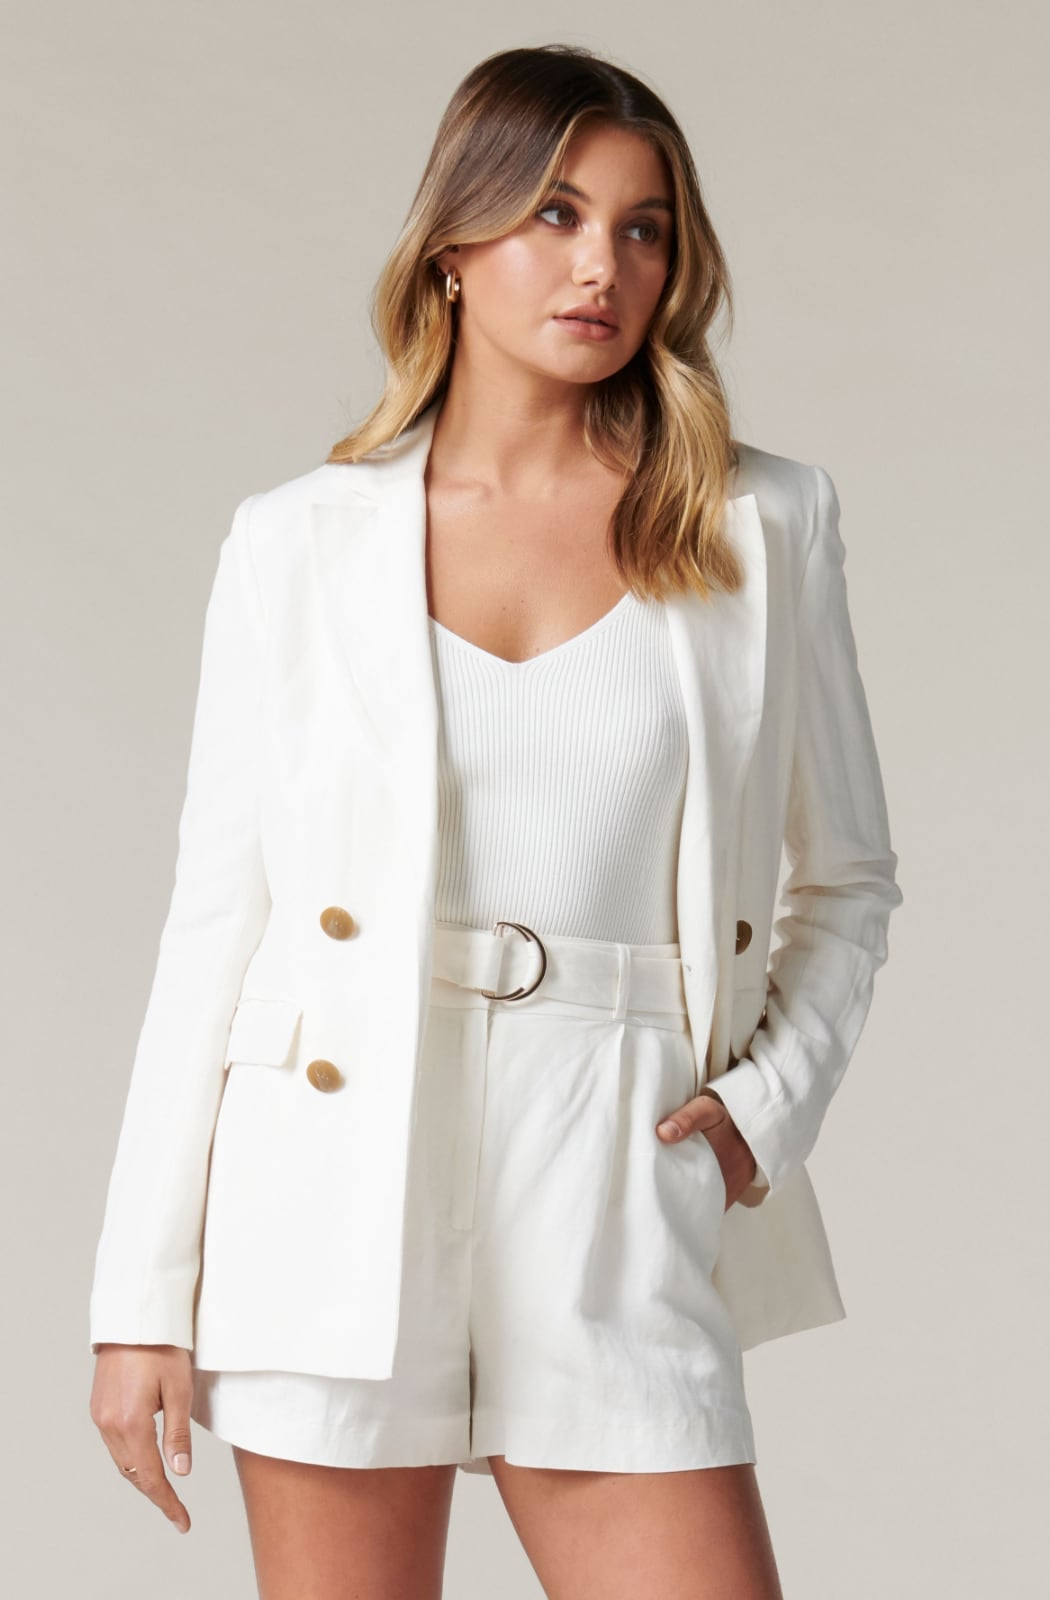 Ever New Women's Clothing - New Blazer Arrivals